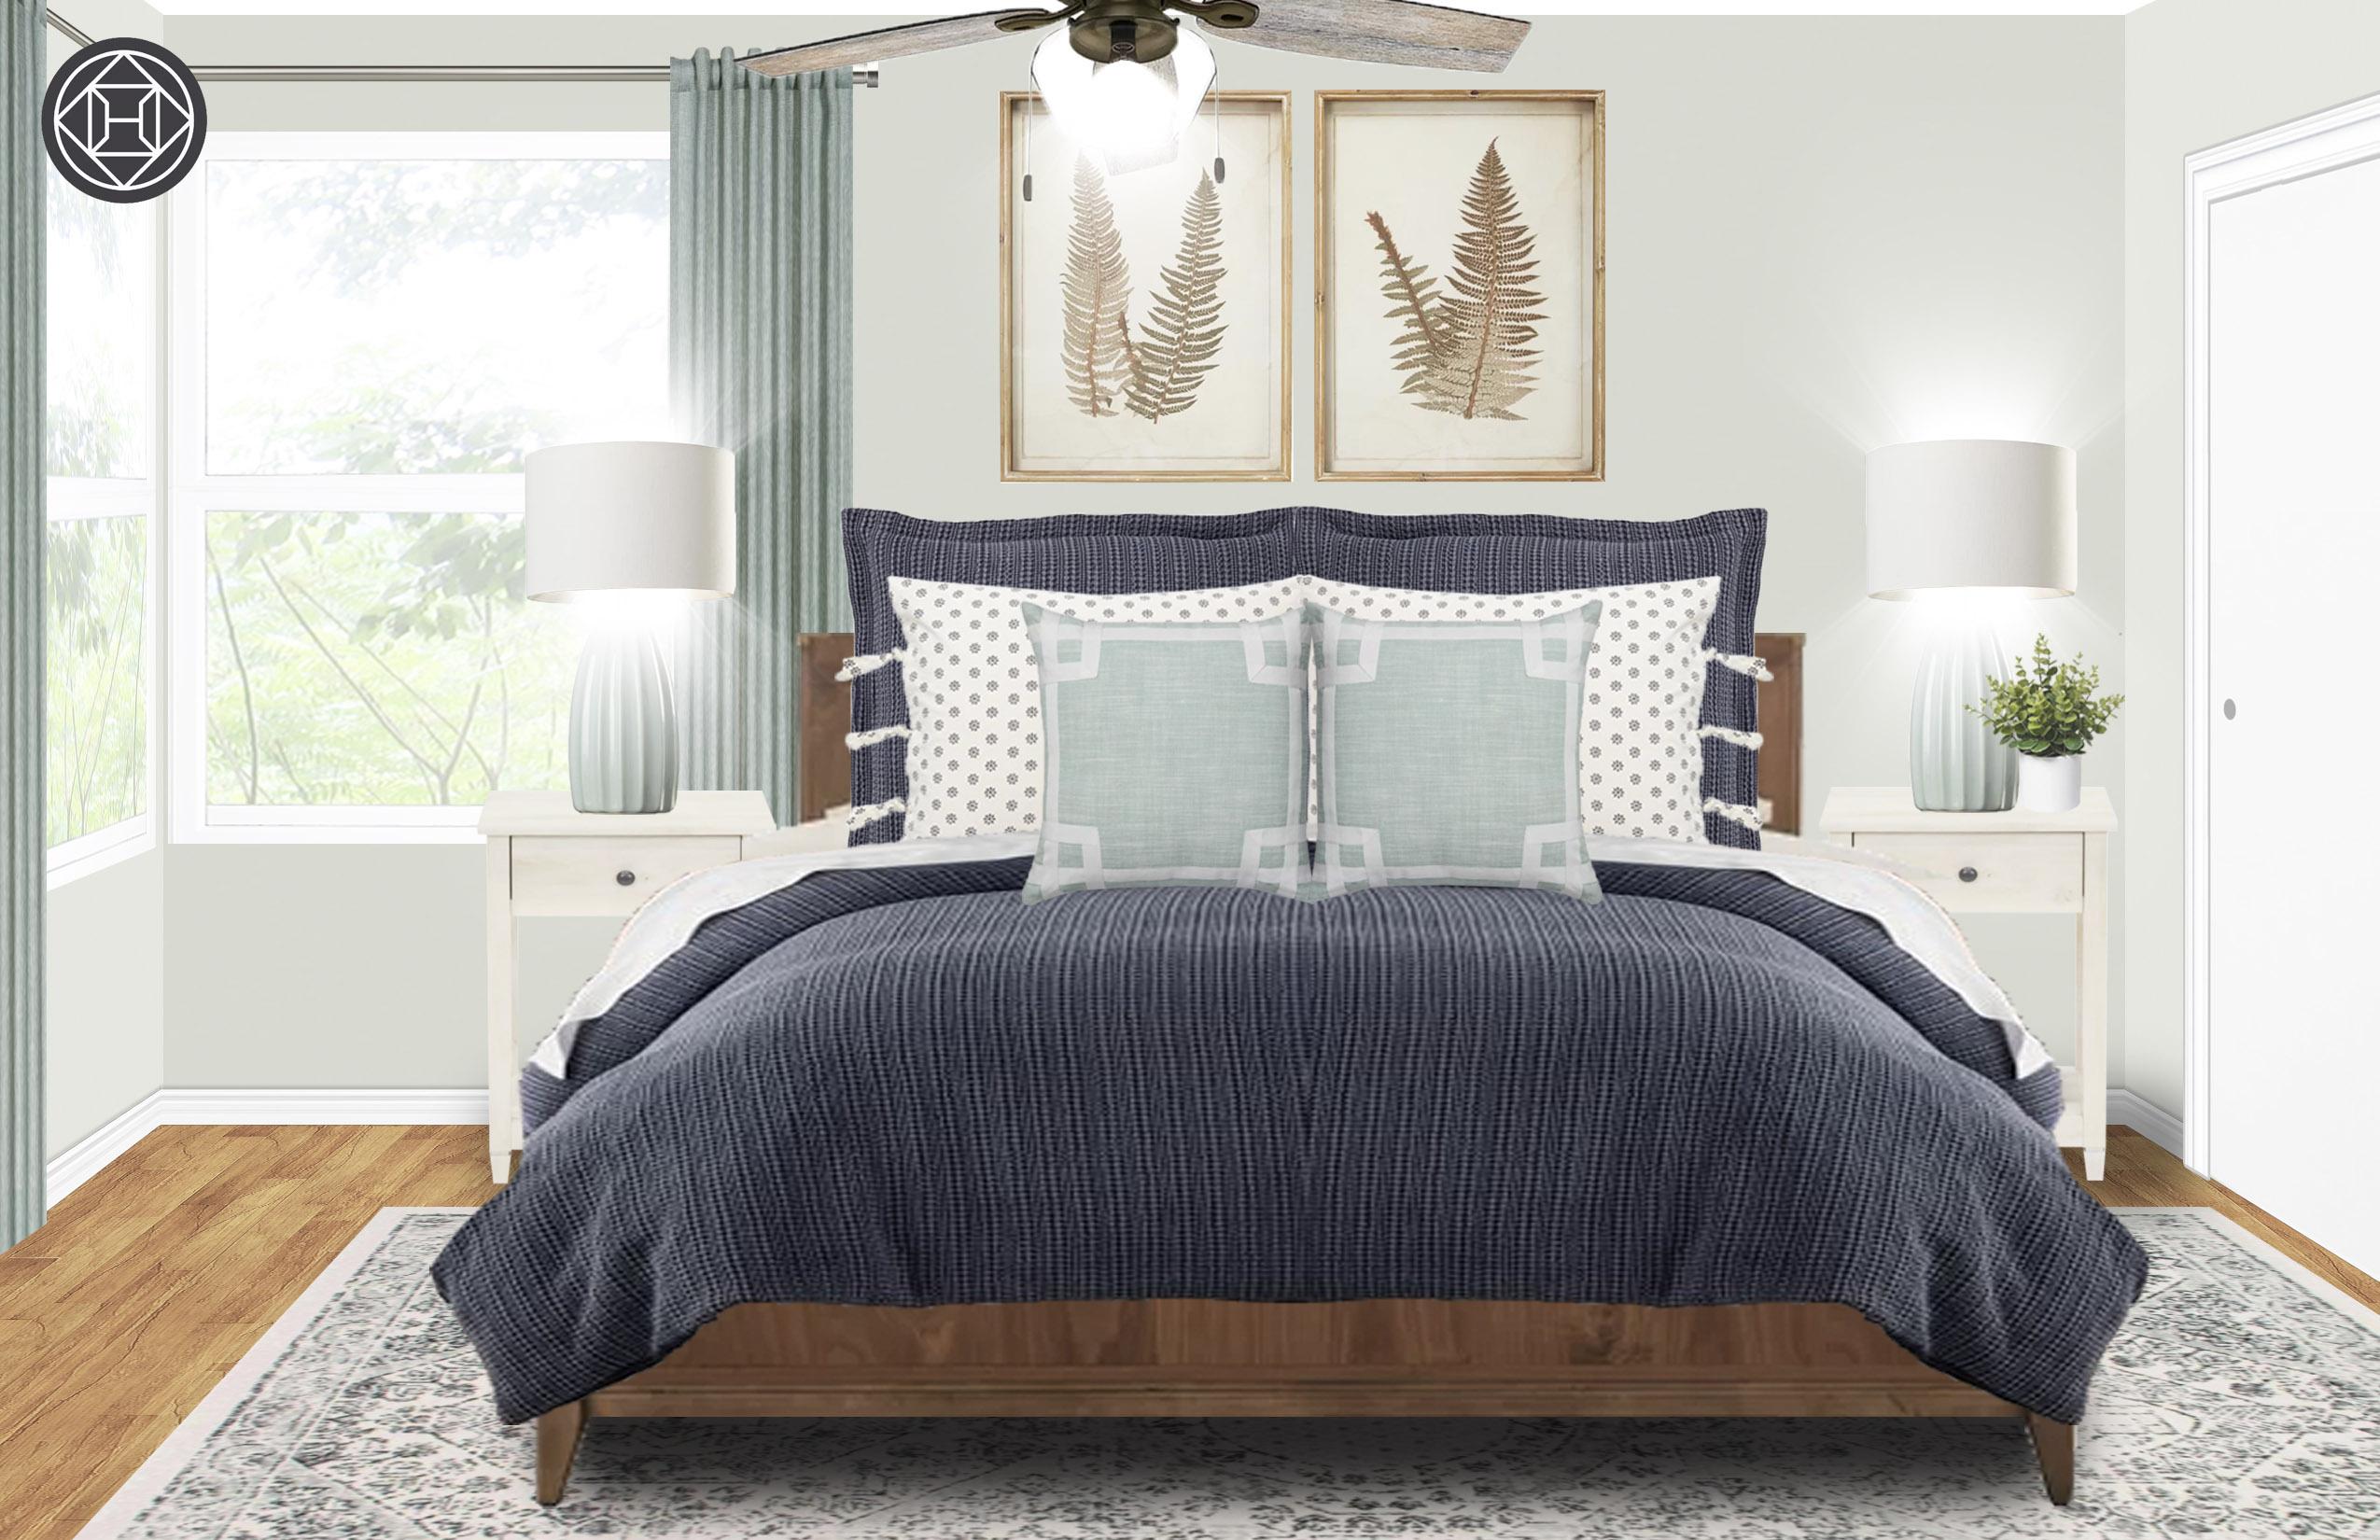 Classic Coastal Farmhouse Bedroom Design By Havenly Interior Designer Meredith